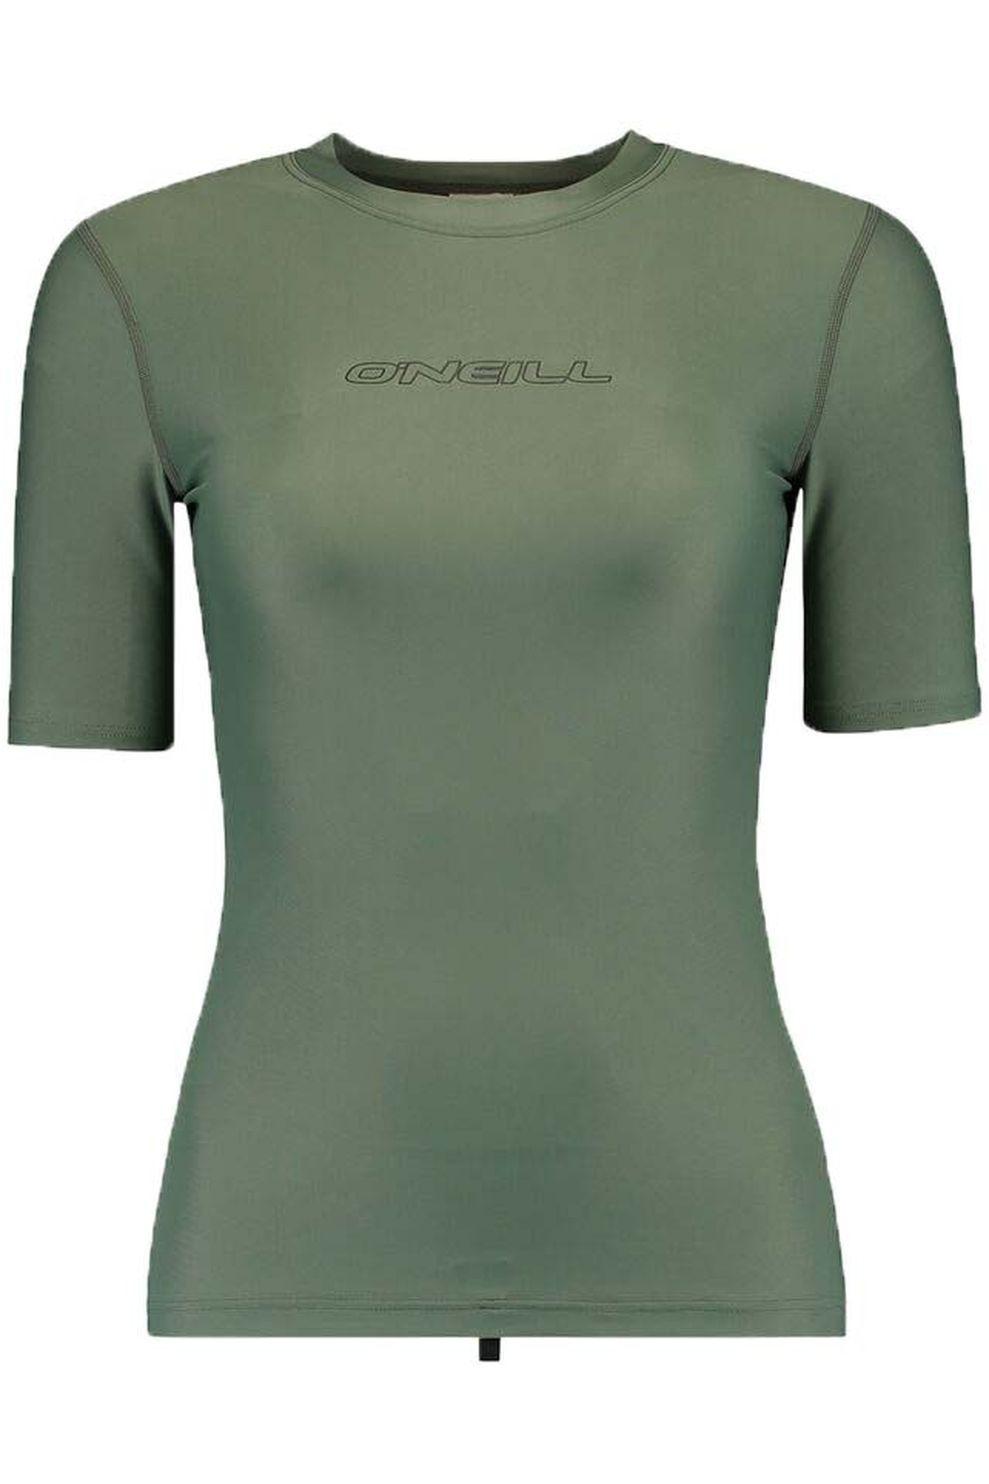 O'Neill Lycra Essential Skins voor dames - Groen - Maten: S, M, L